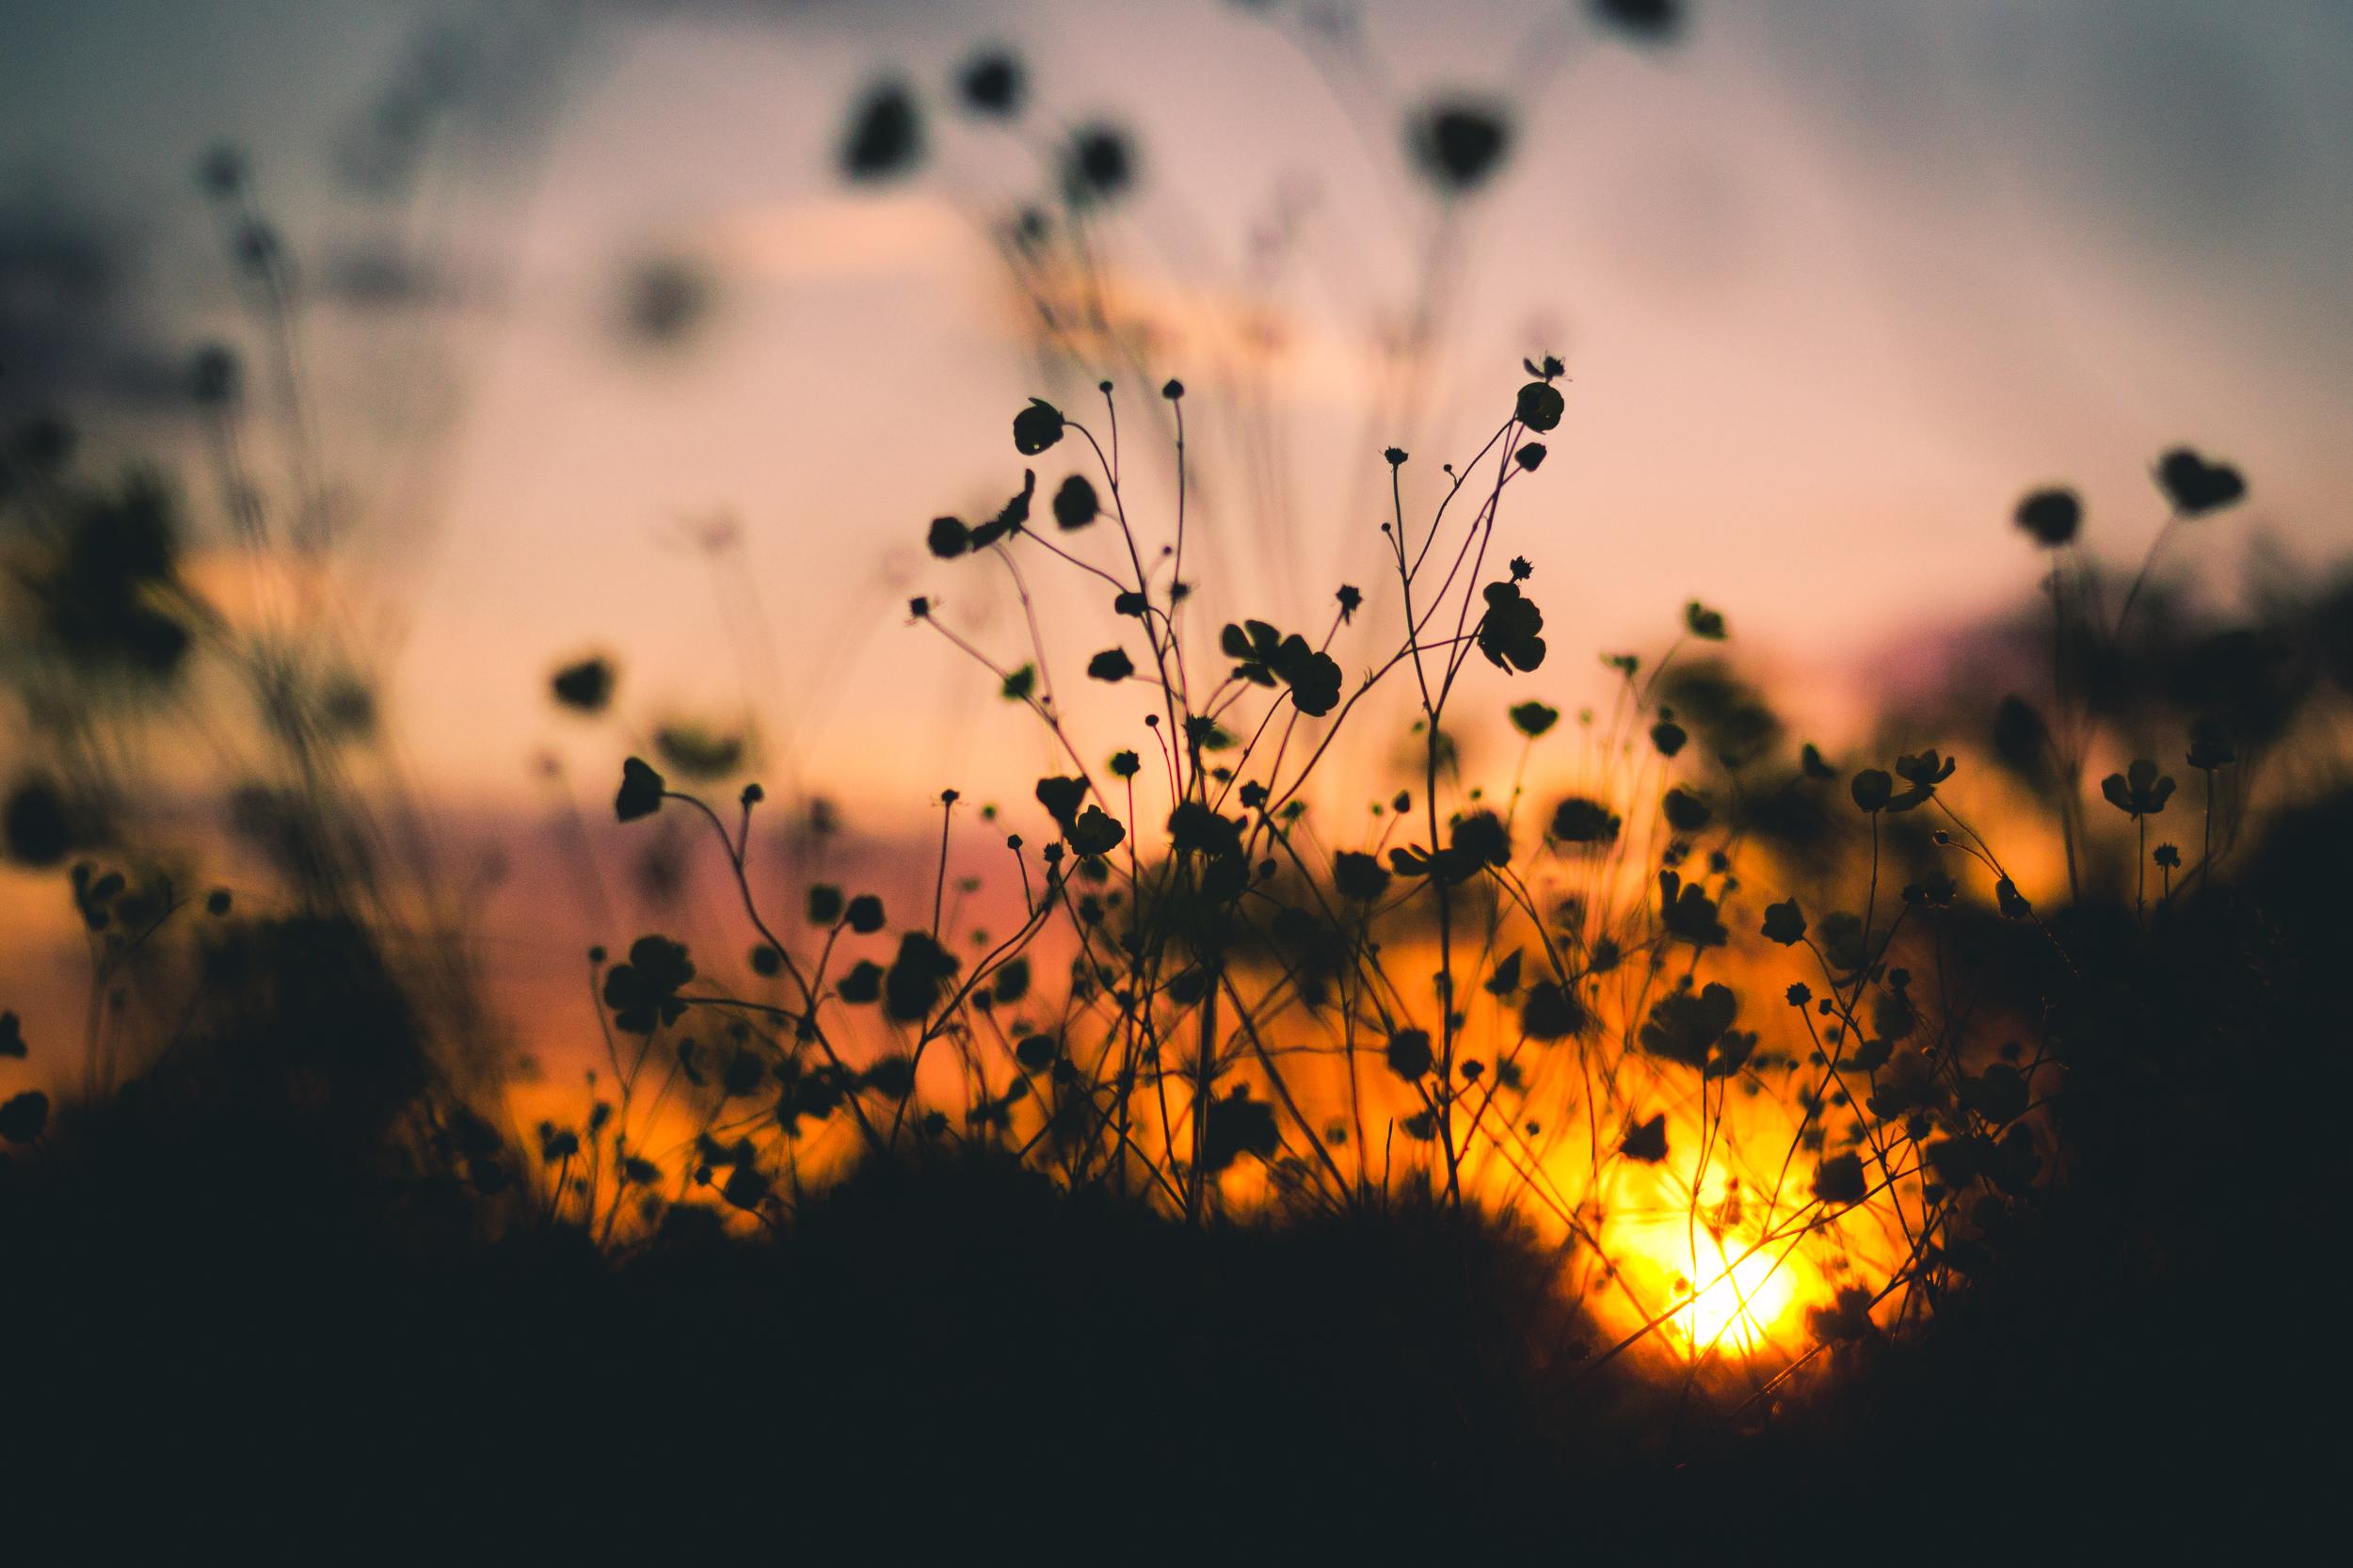 sunset-0291-2.jpg